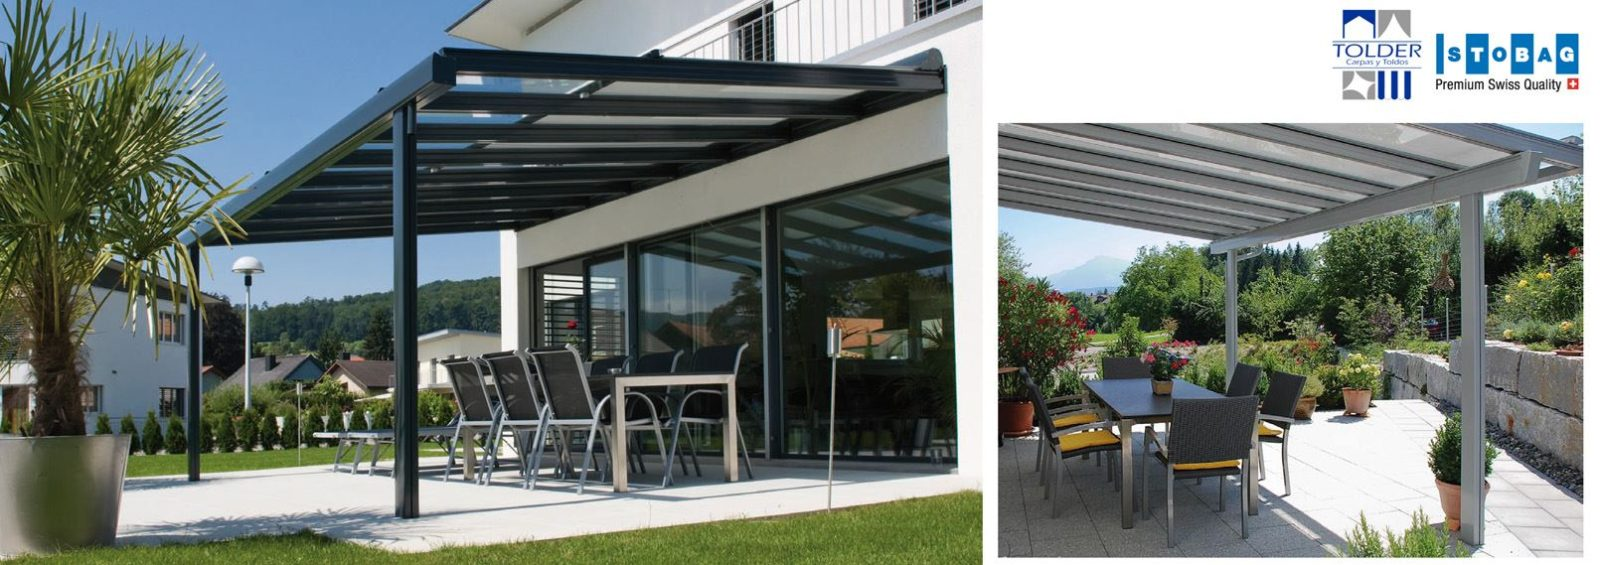 Toldos stobag para balcones y terrazas tolder for Toldos para terrazas economicos